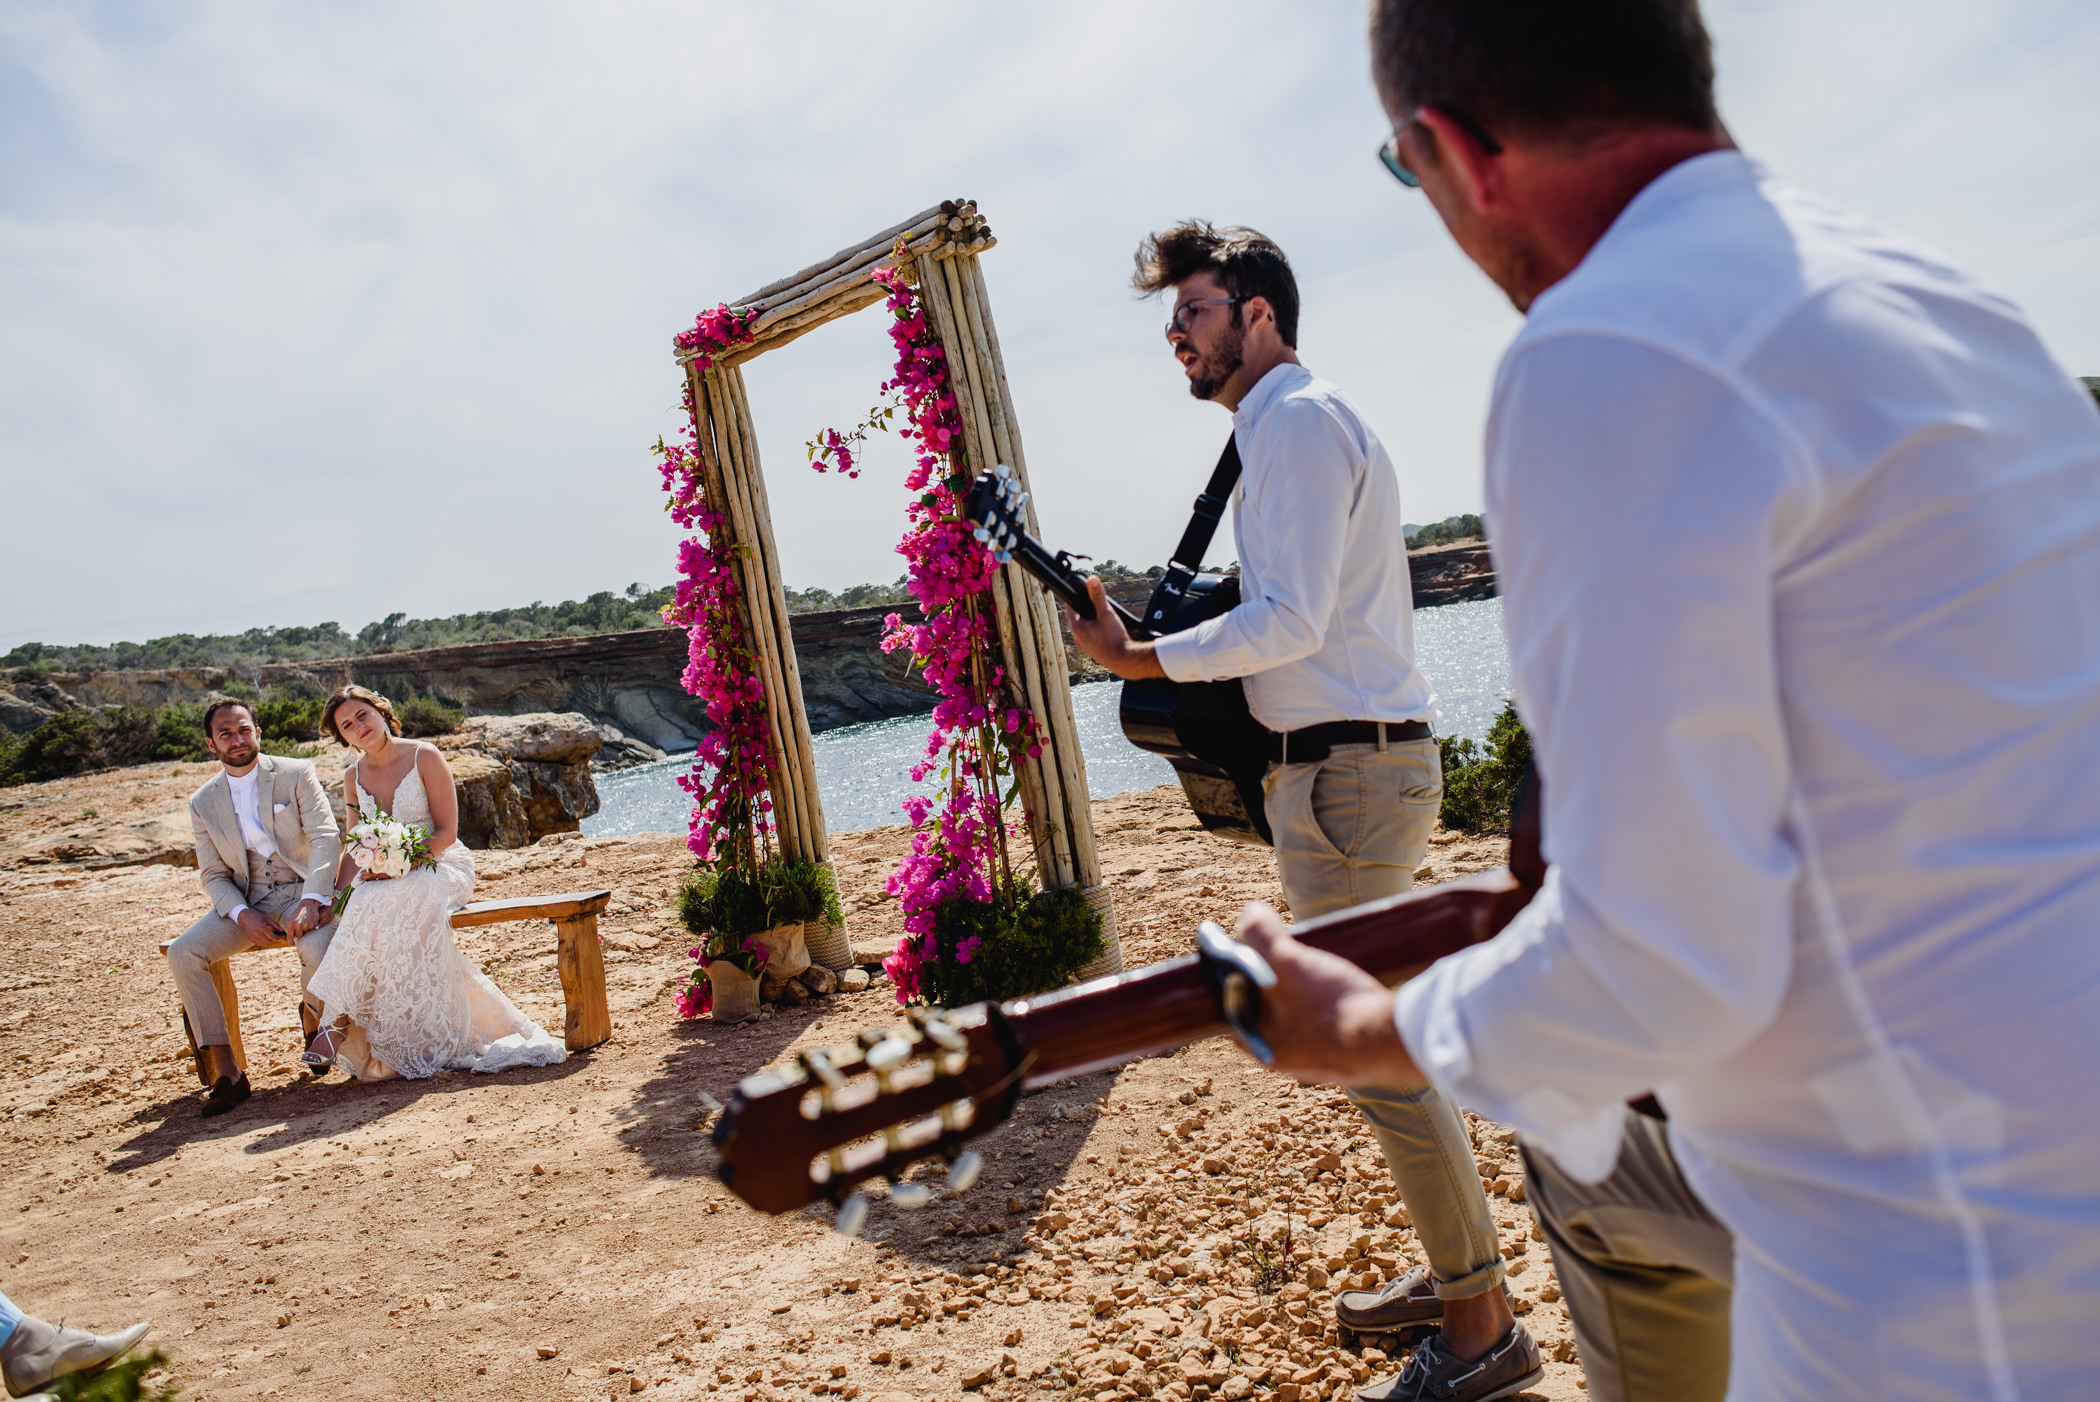 CAN-SERGENT-IBIZA-WEDDING-34.jpg